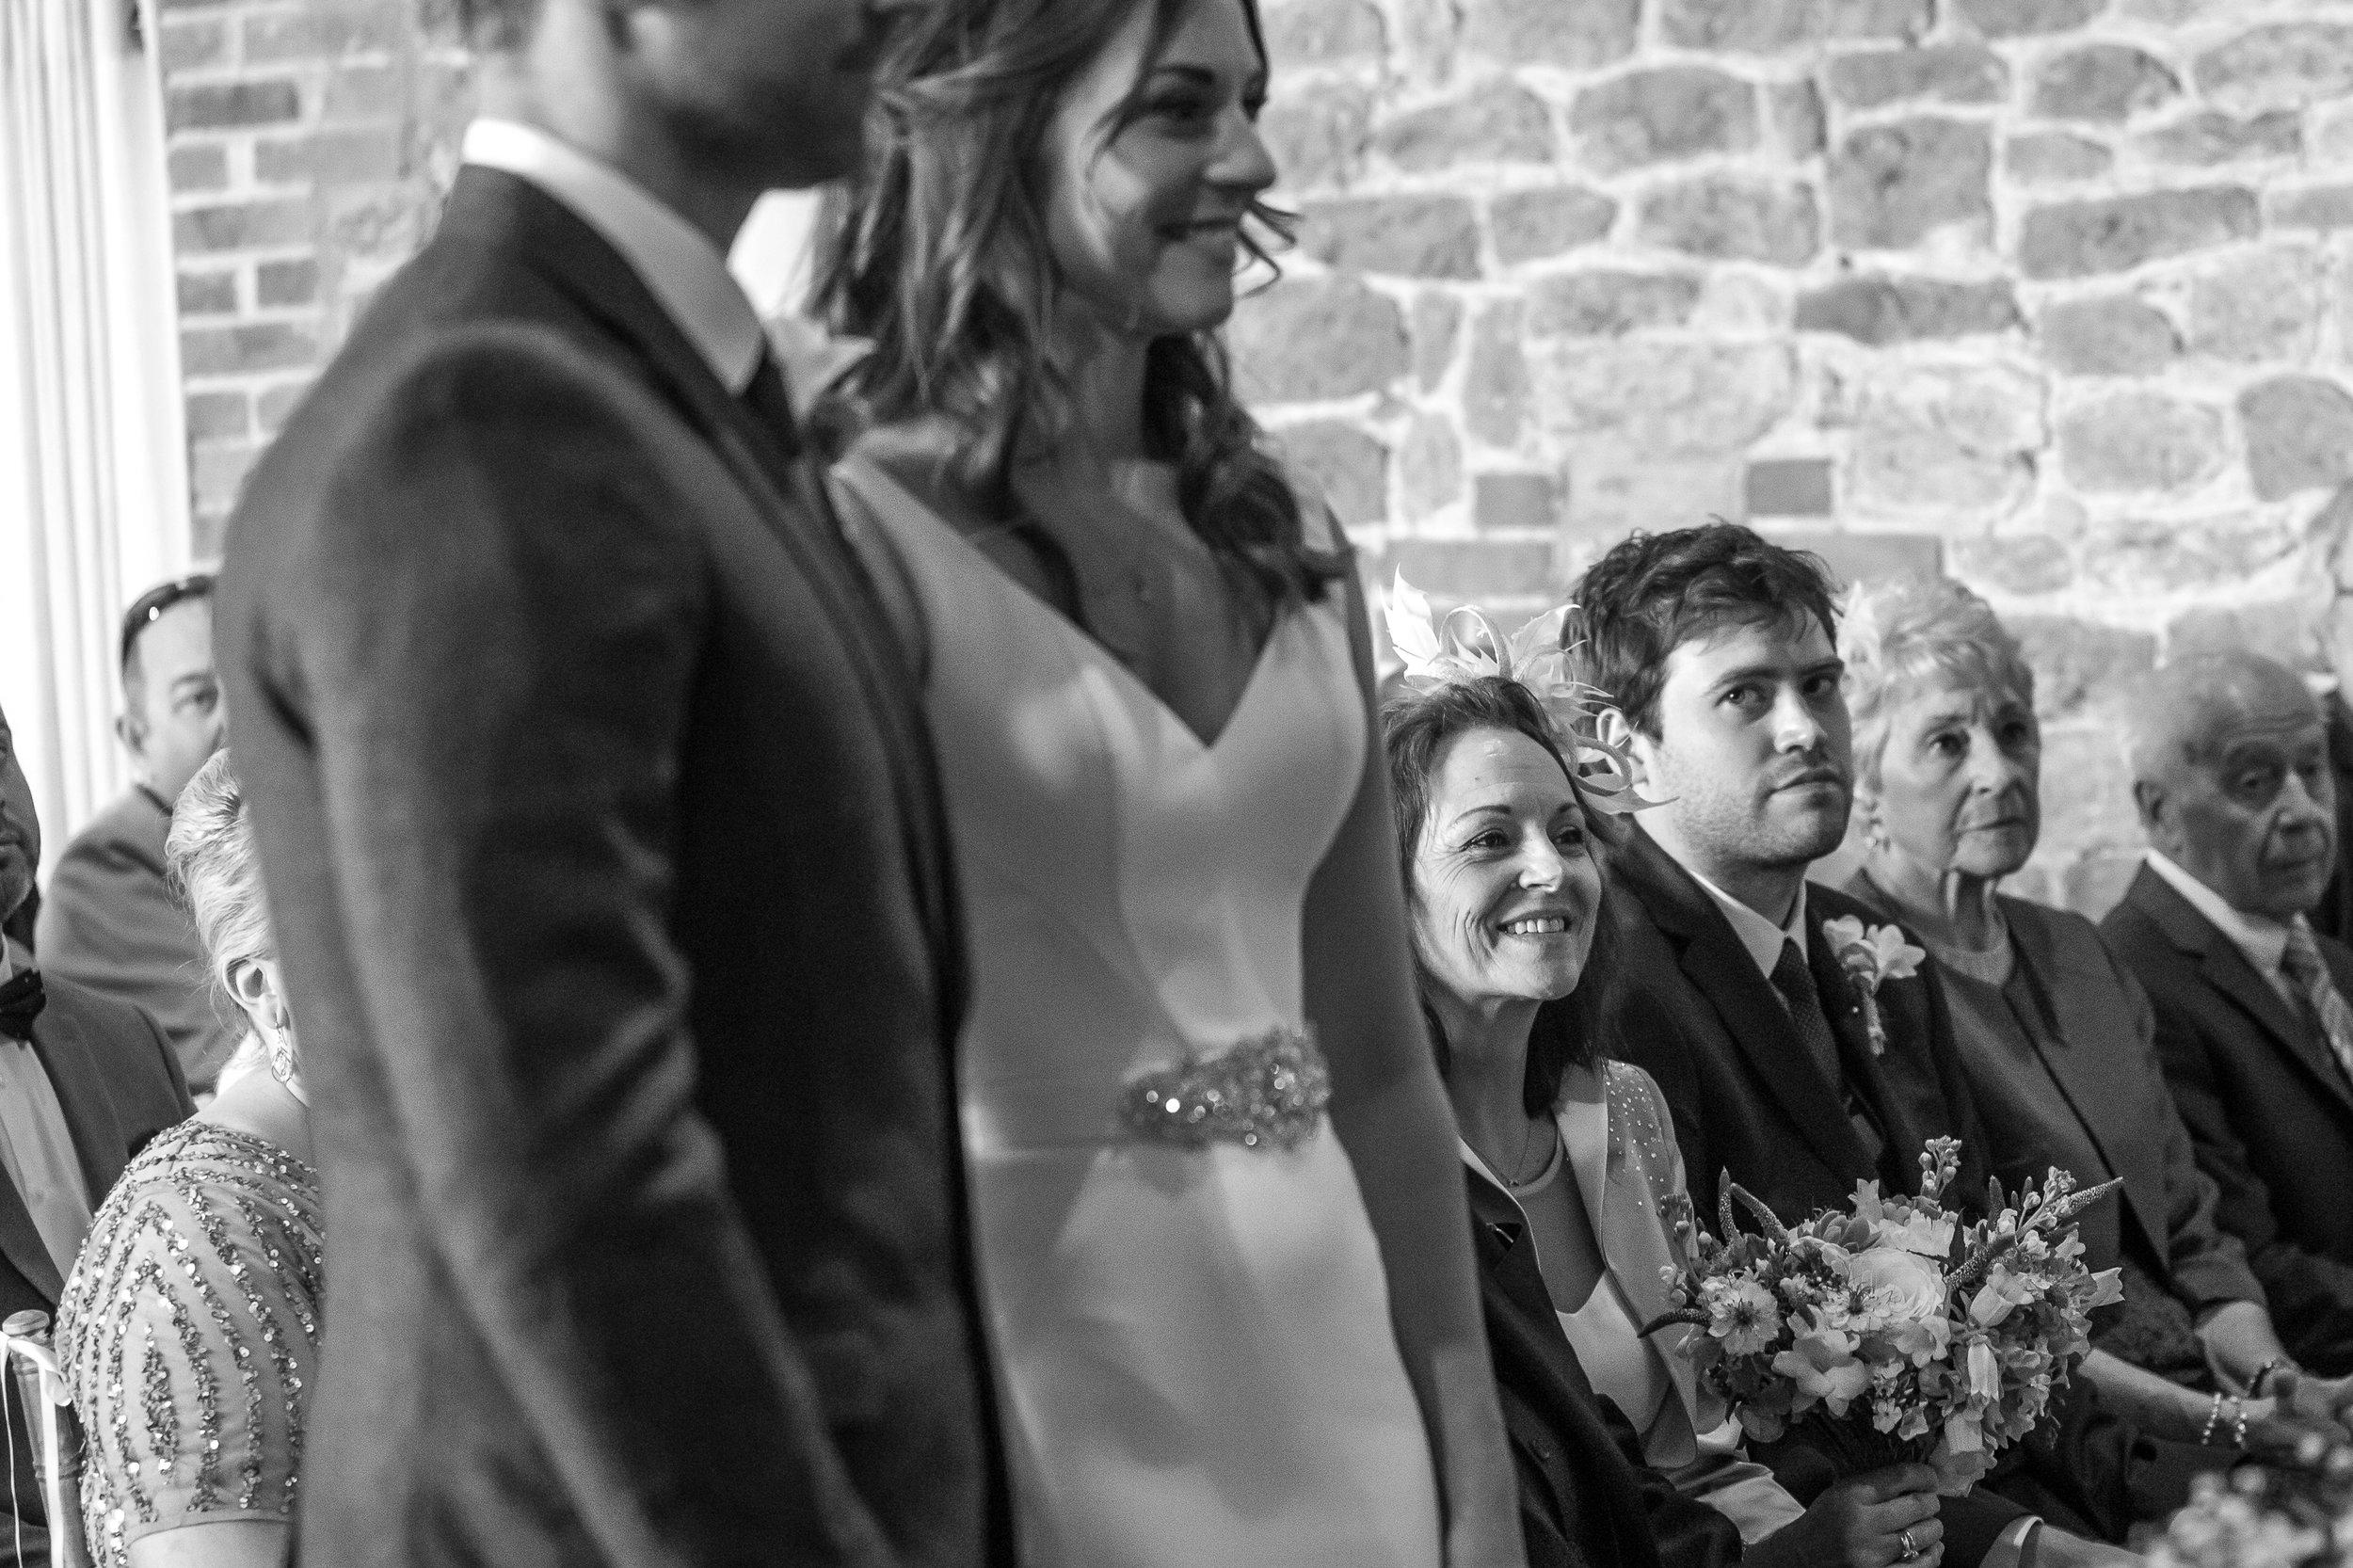 Grittenham Barn female wedding photographers west sussex petworth social-52.jpg